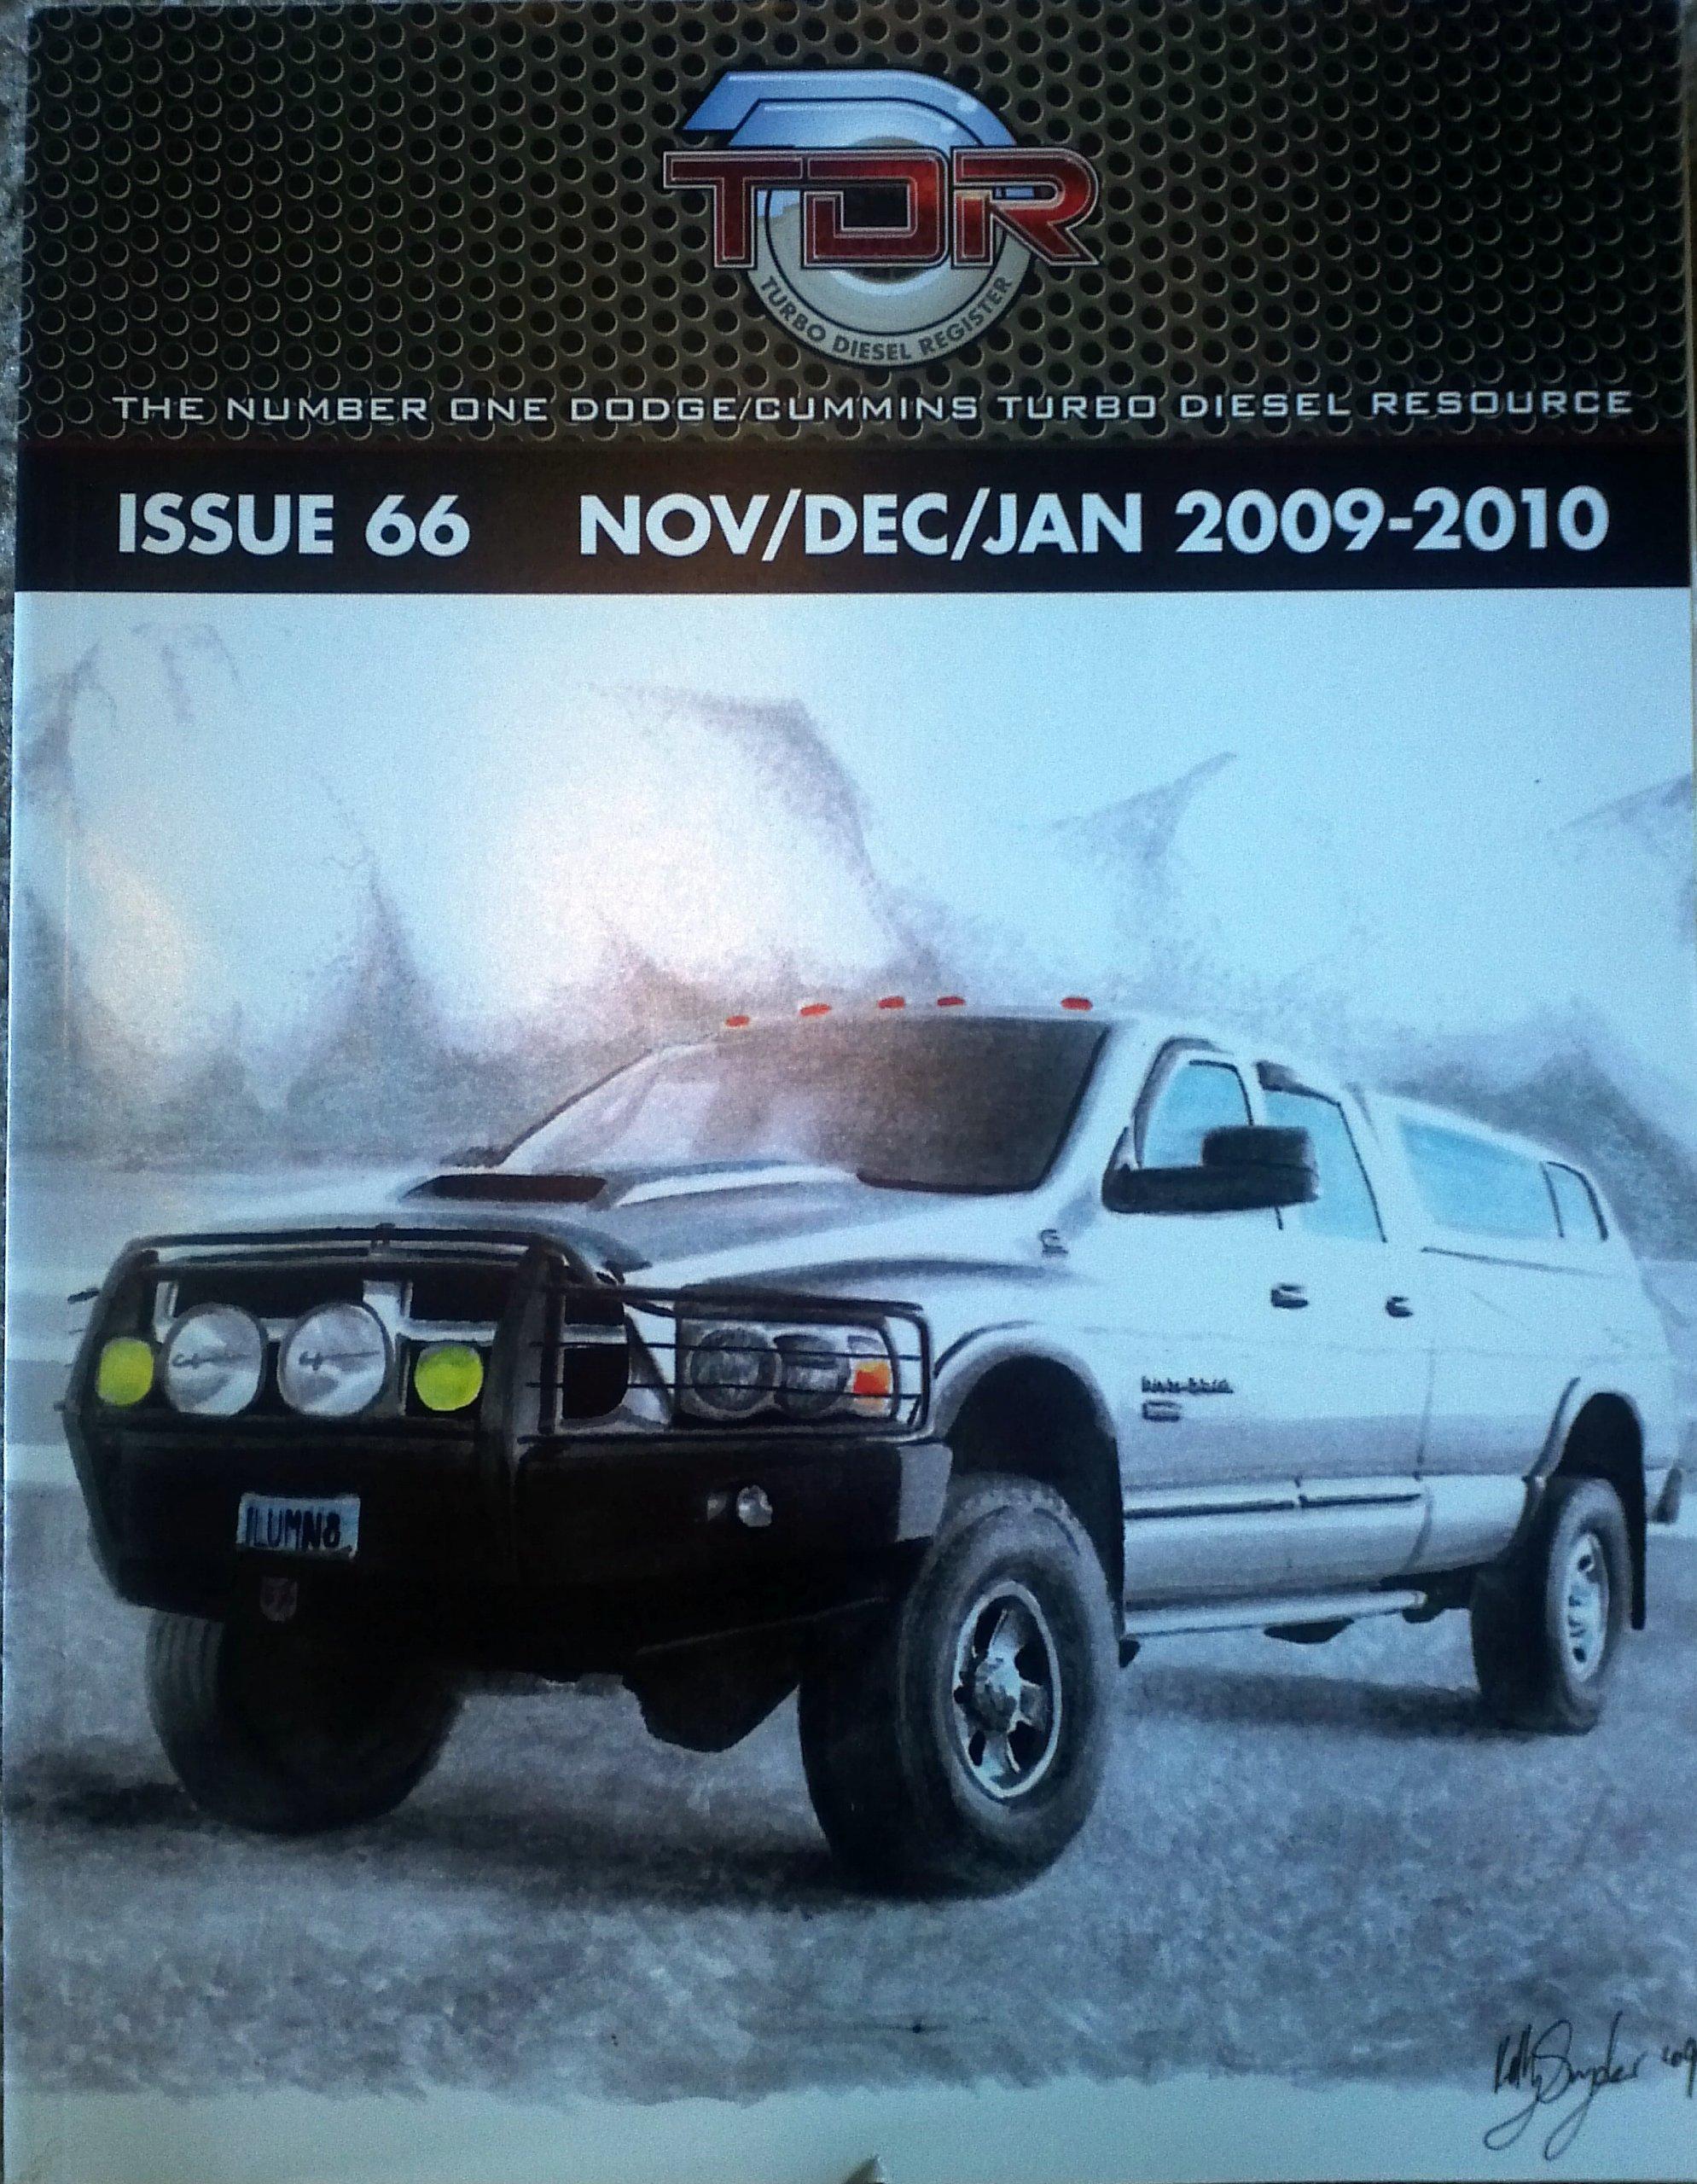 TDR Turbo Diesel Register Issue 66 Nov Dec Jan 2009 2010 Turbo